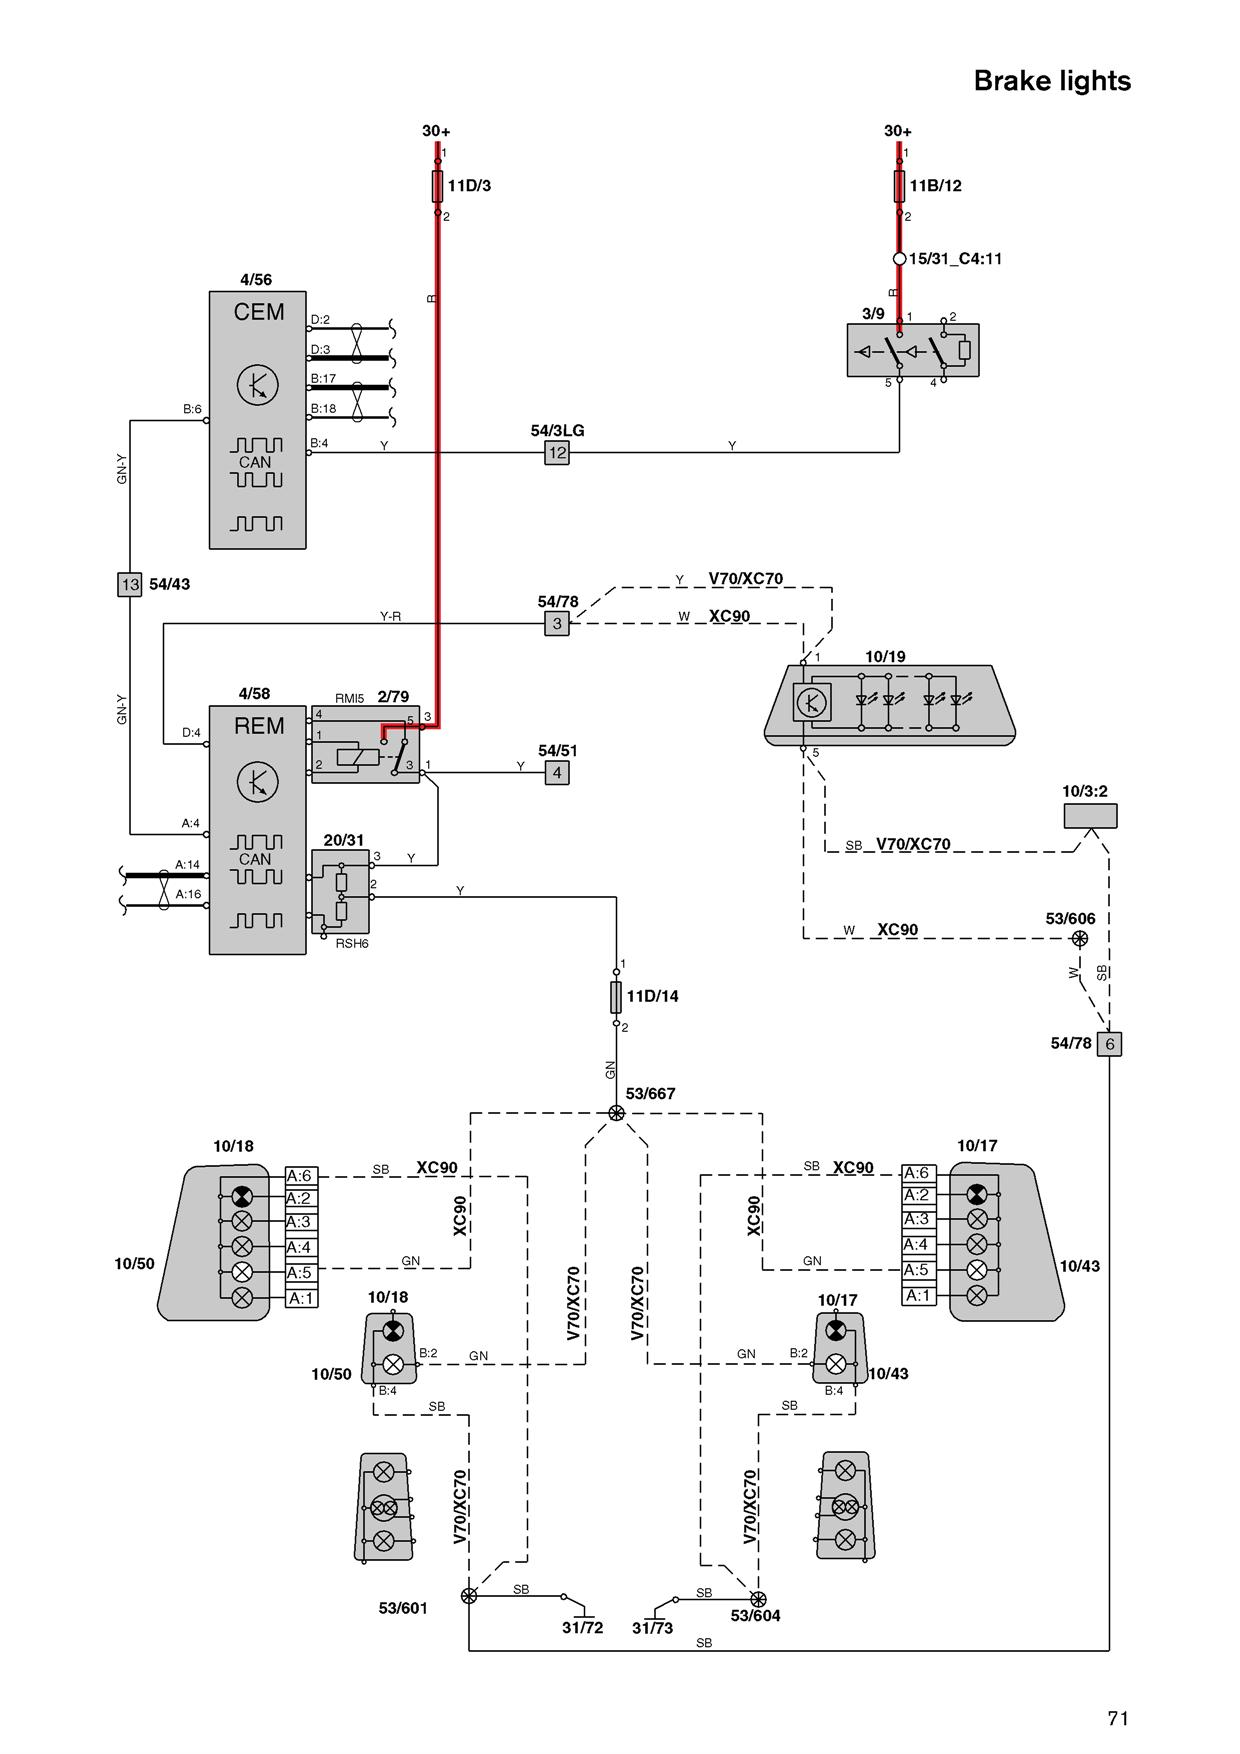 2006 volvo s40 fuse box diagram 2006 dodge ram fuse box